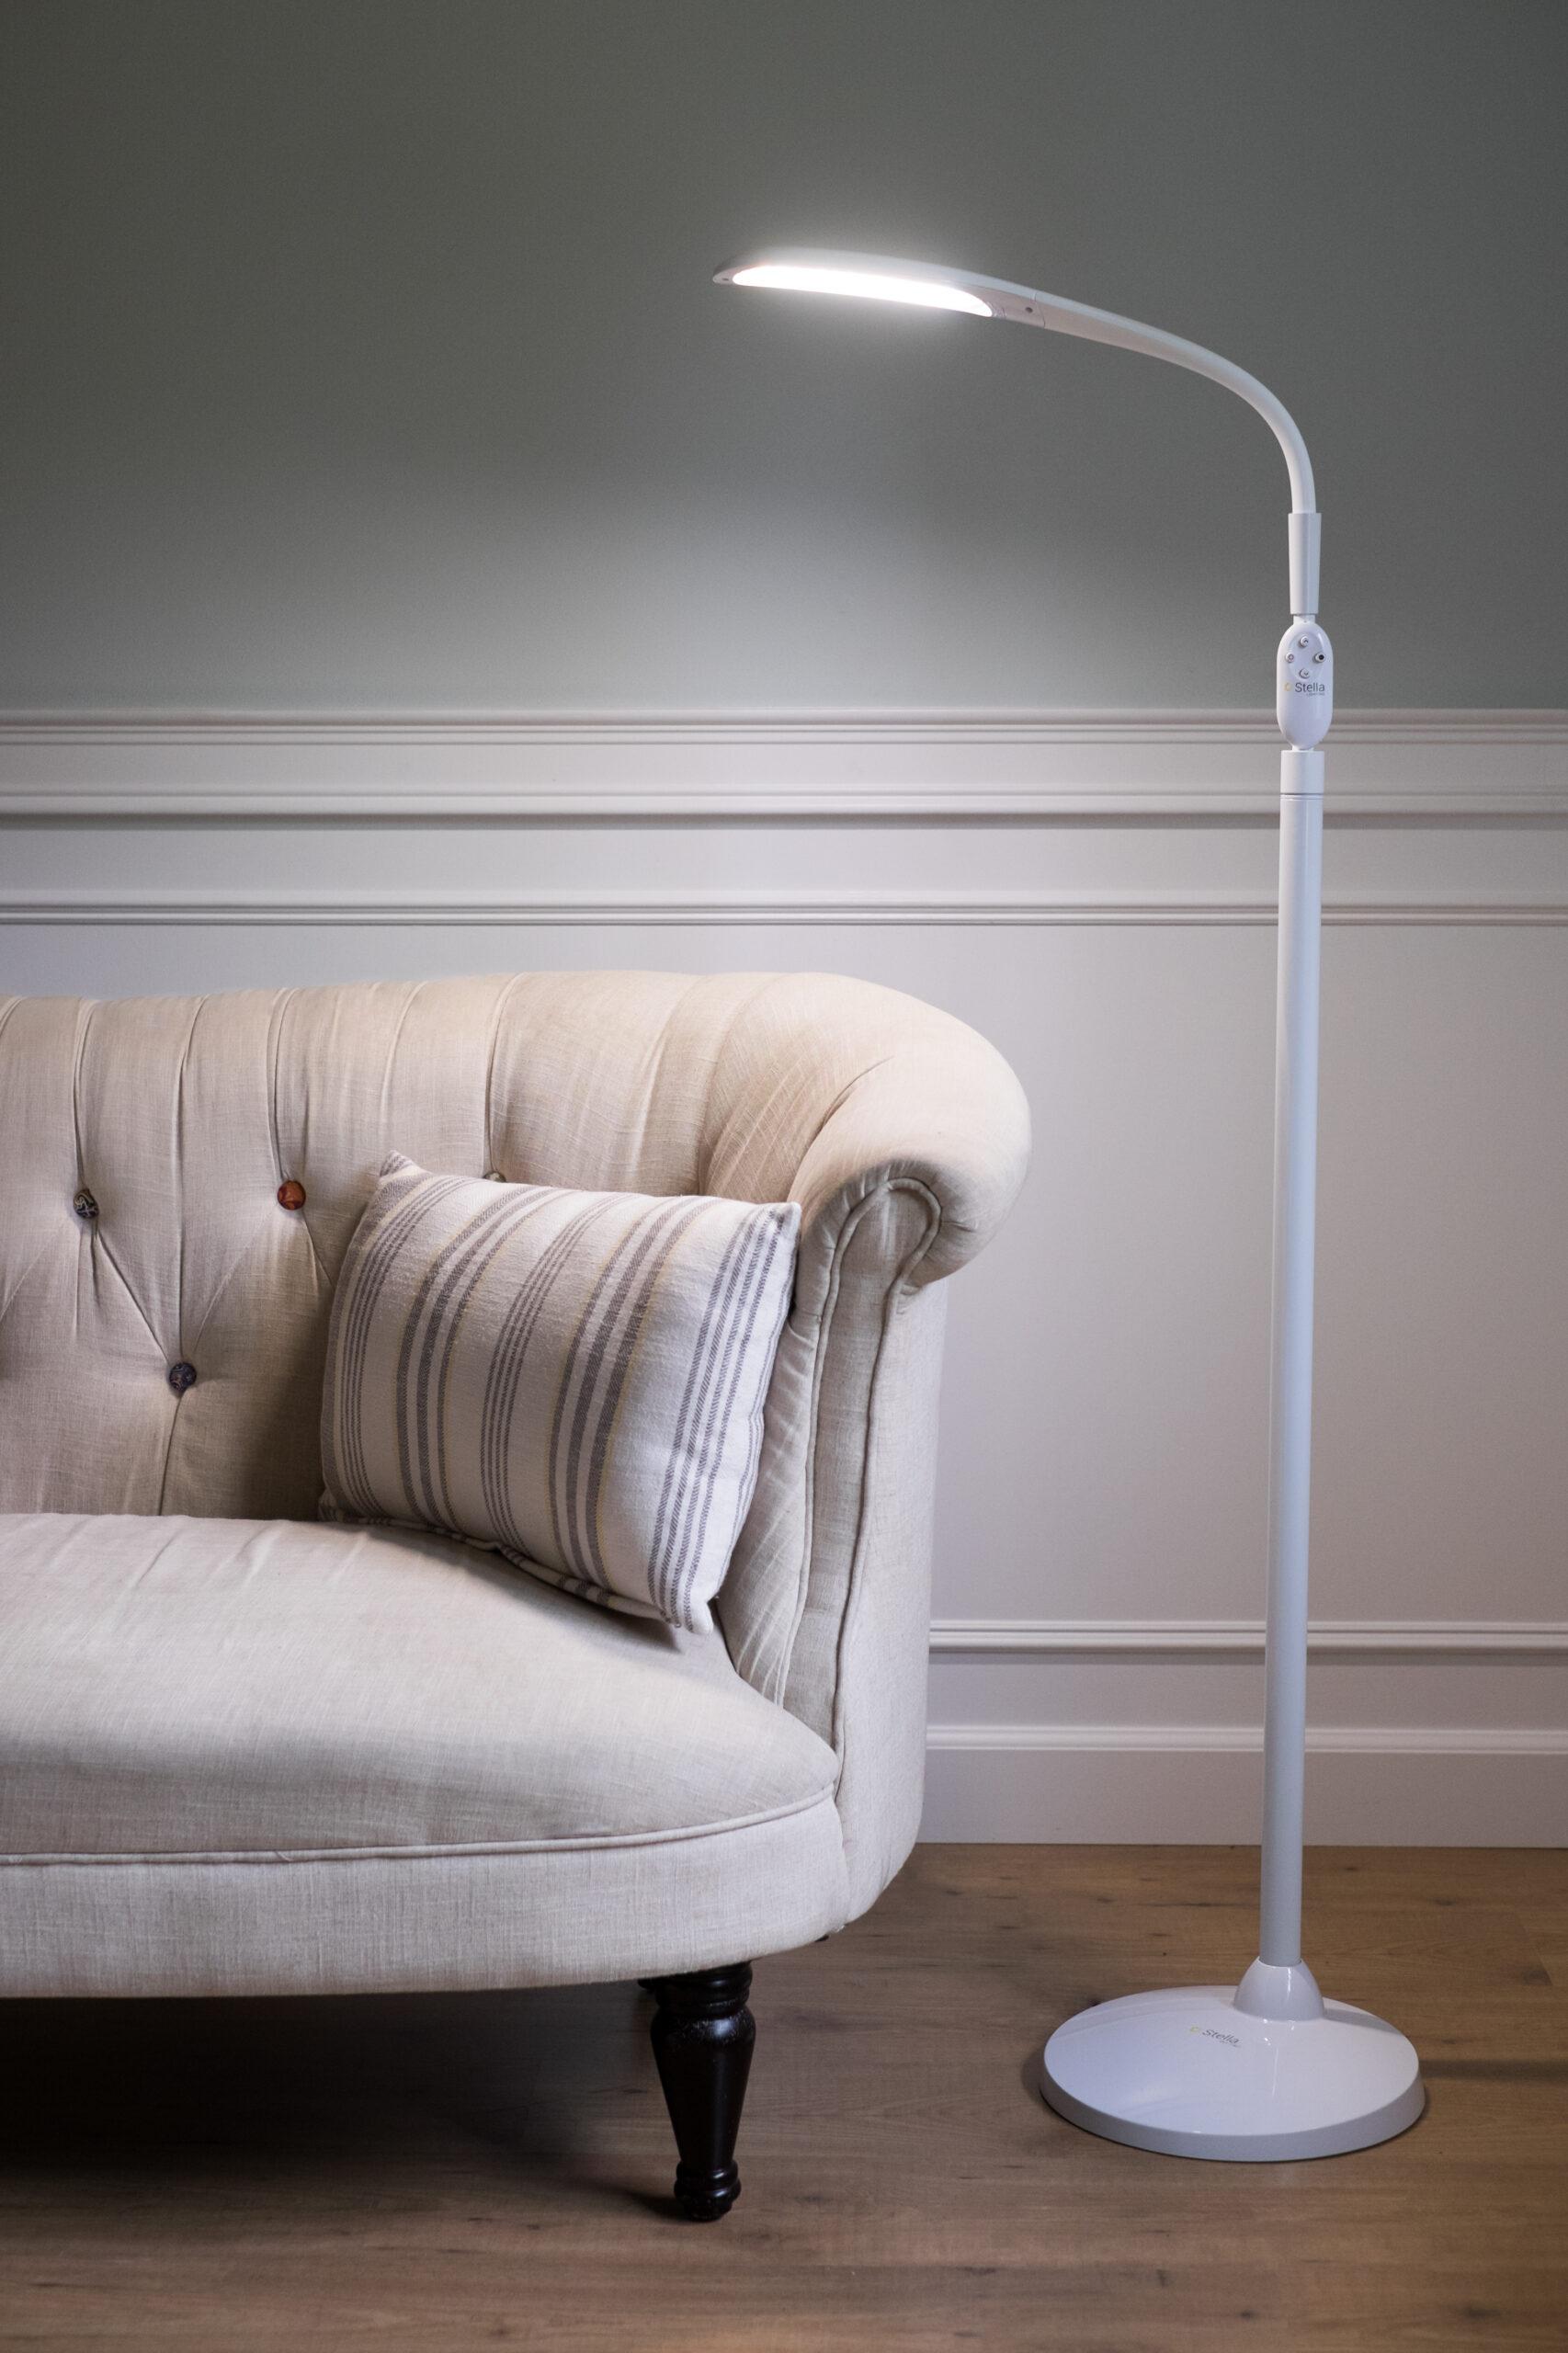 Low vision floor lamps improve ambient room lighting.